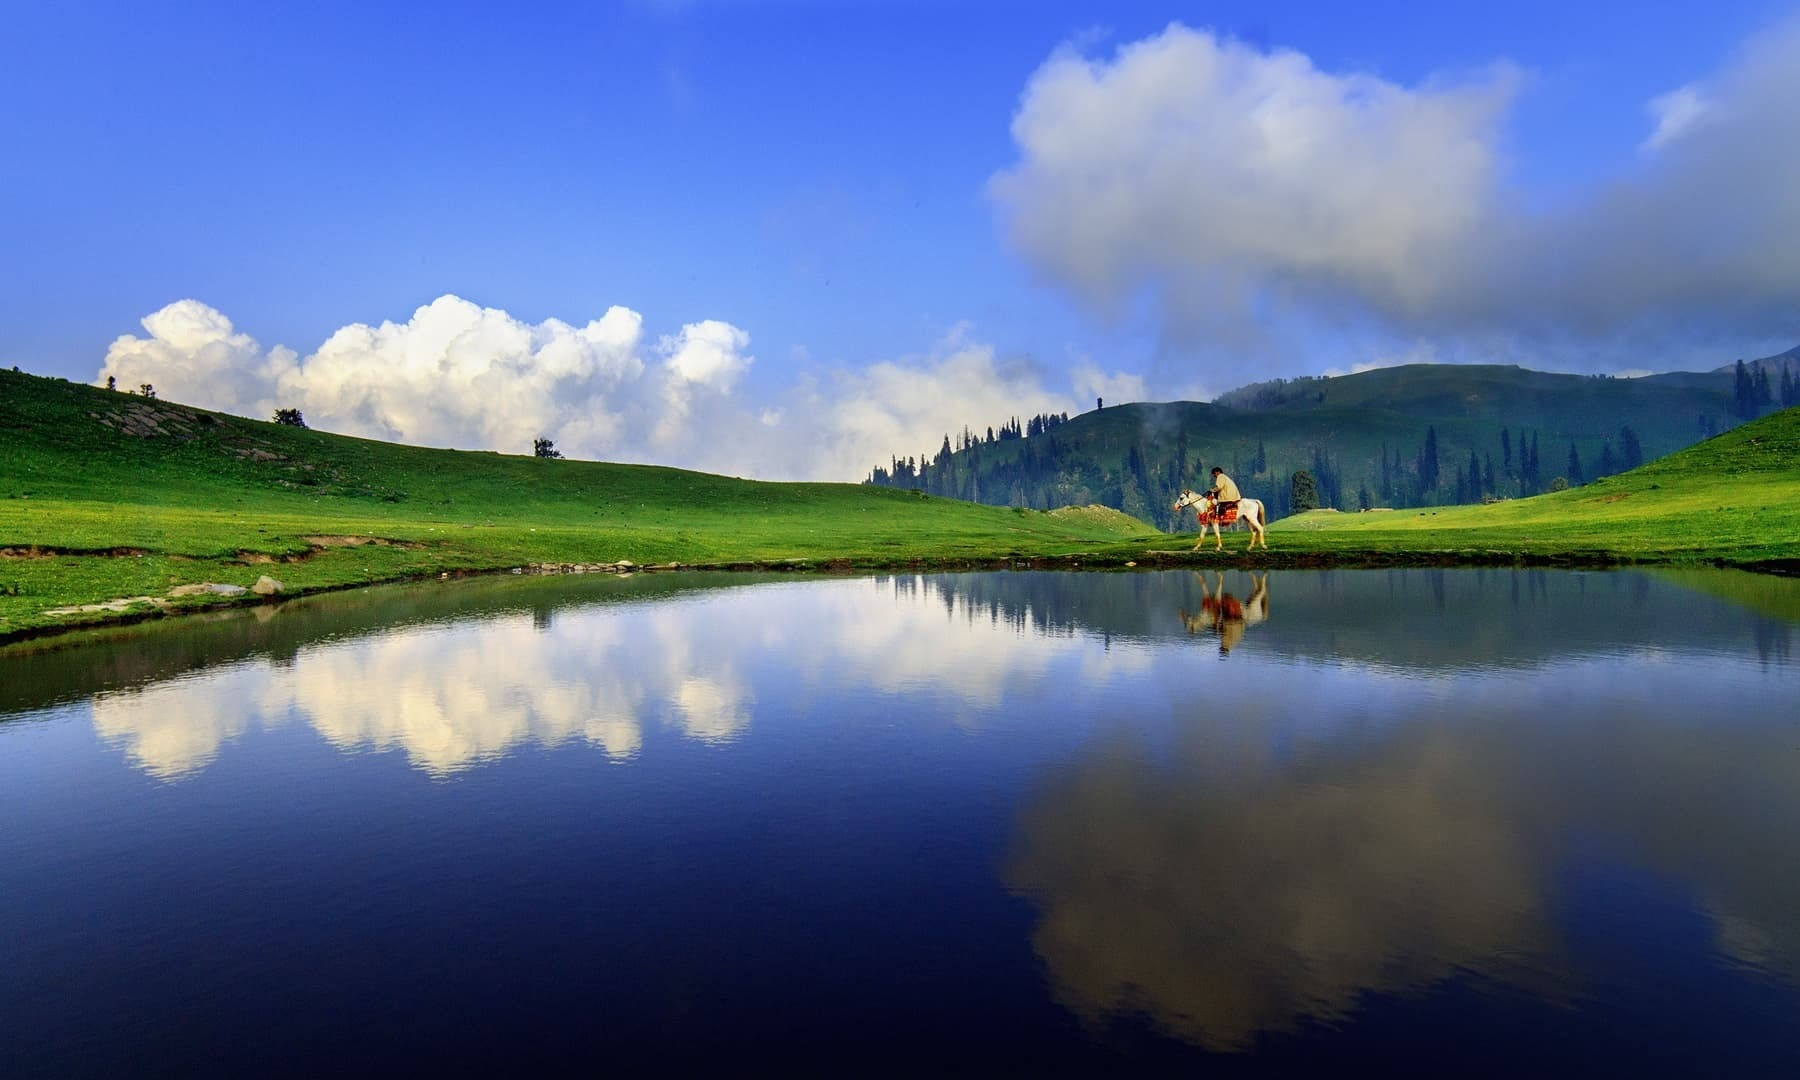 — S.M.Bukhari's Photography